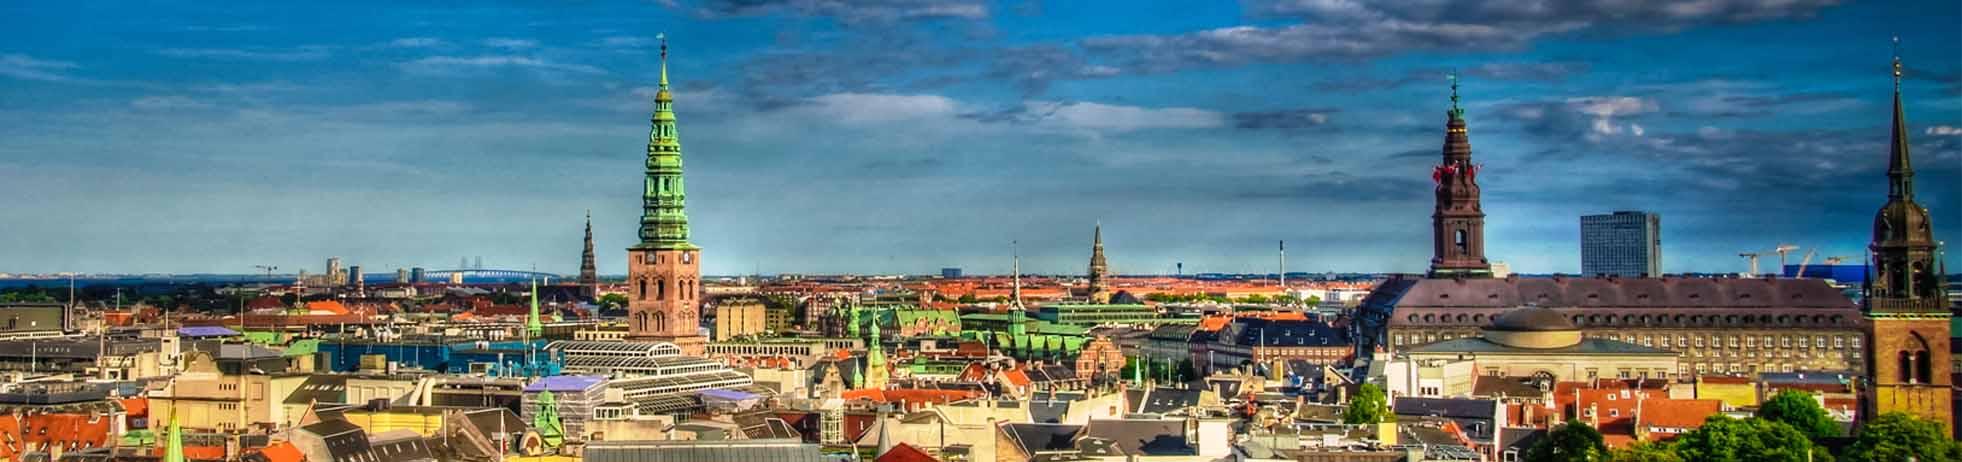 Denmark skyline landscape